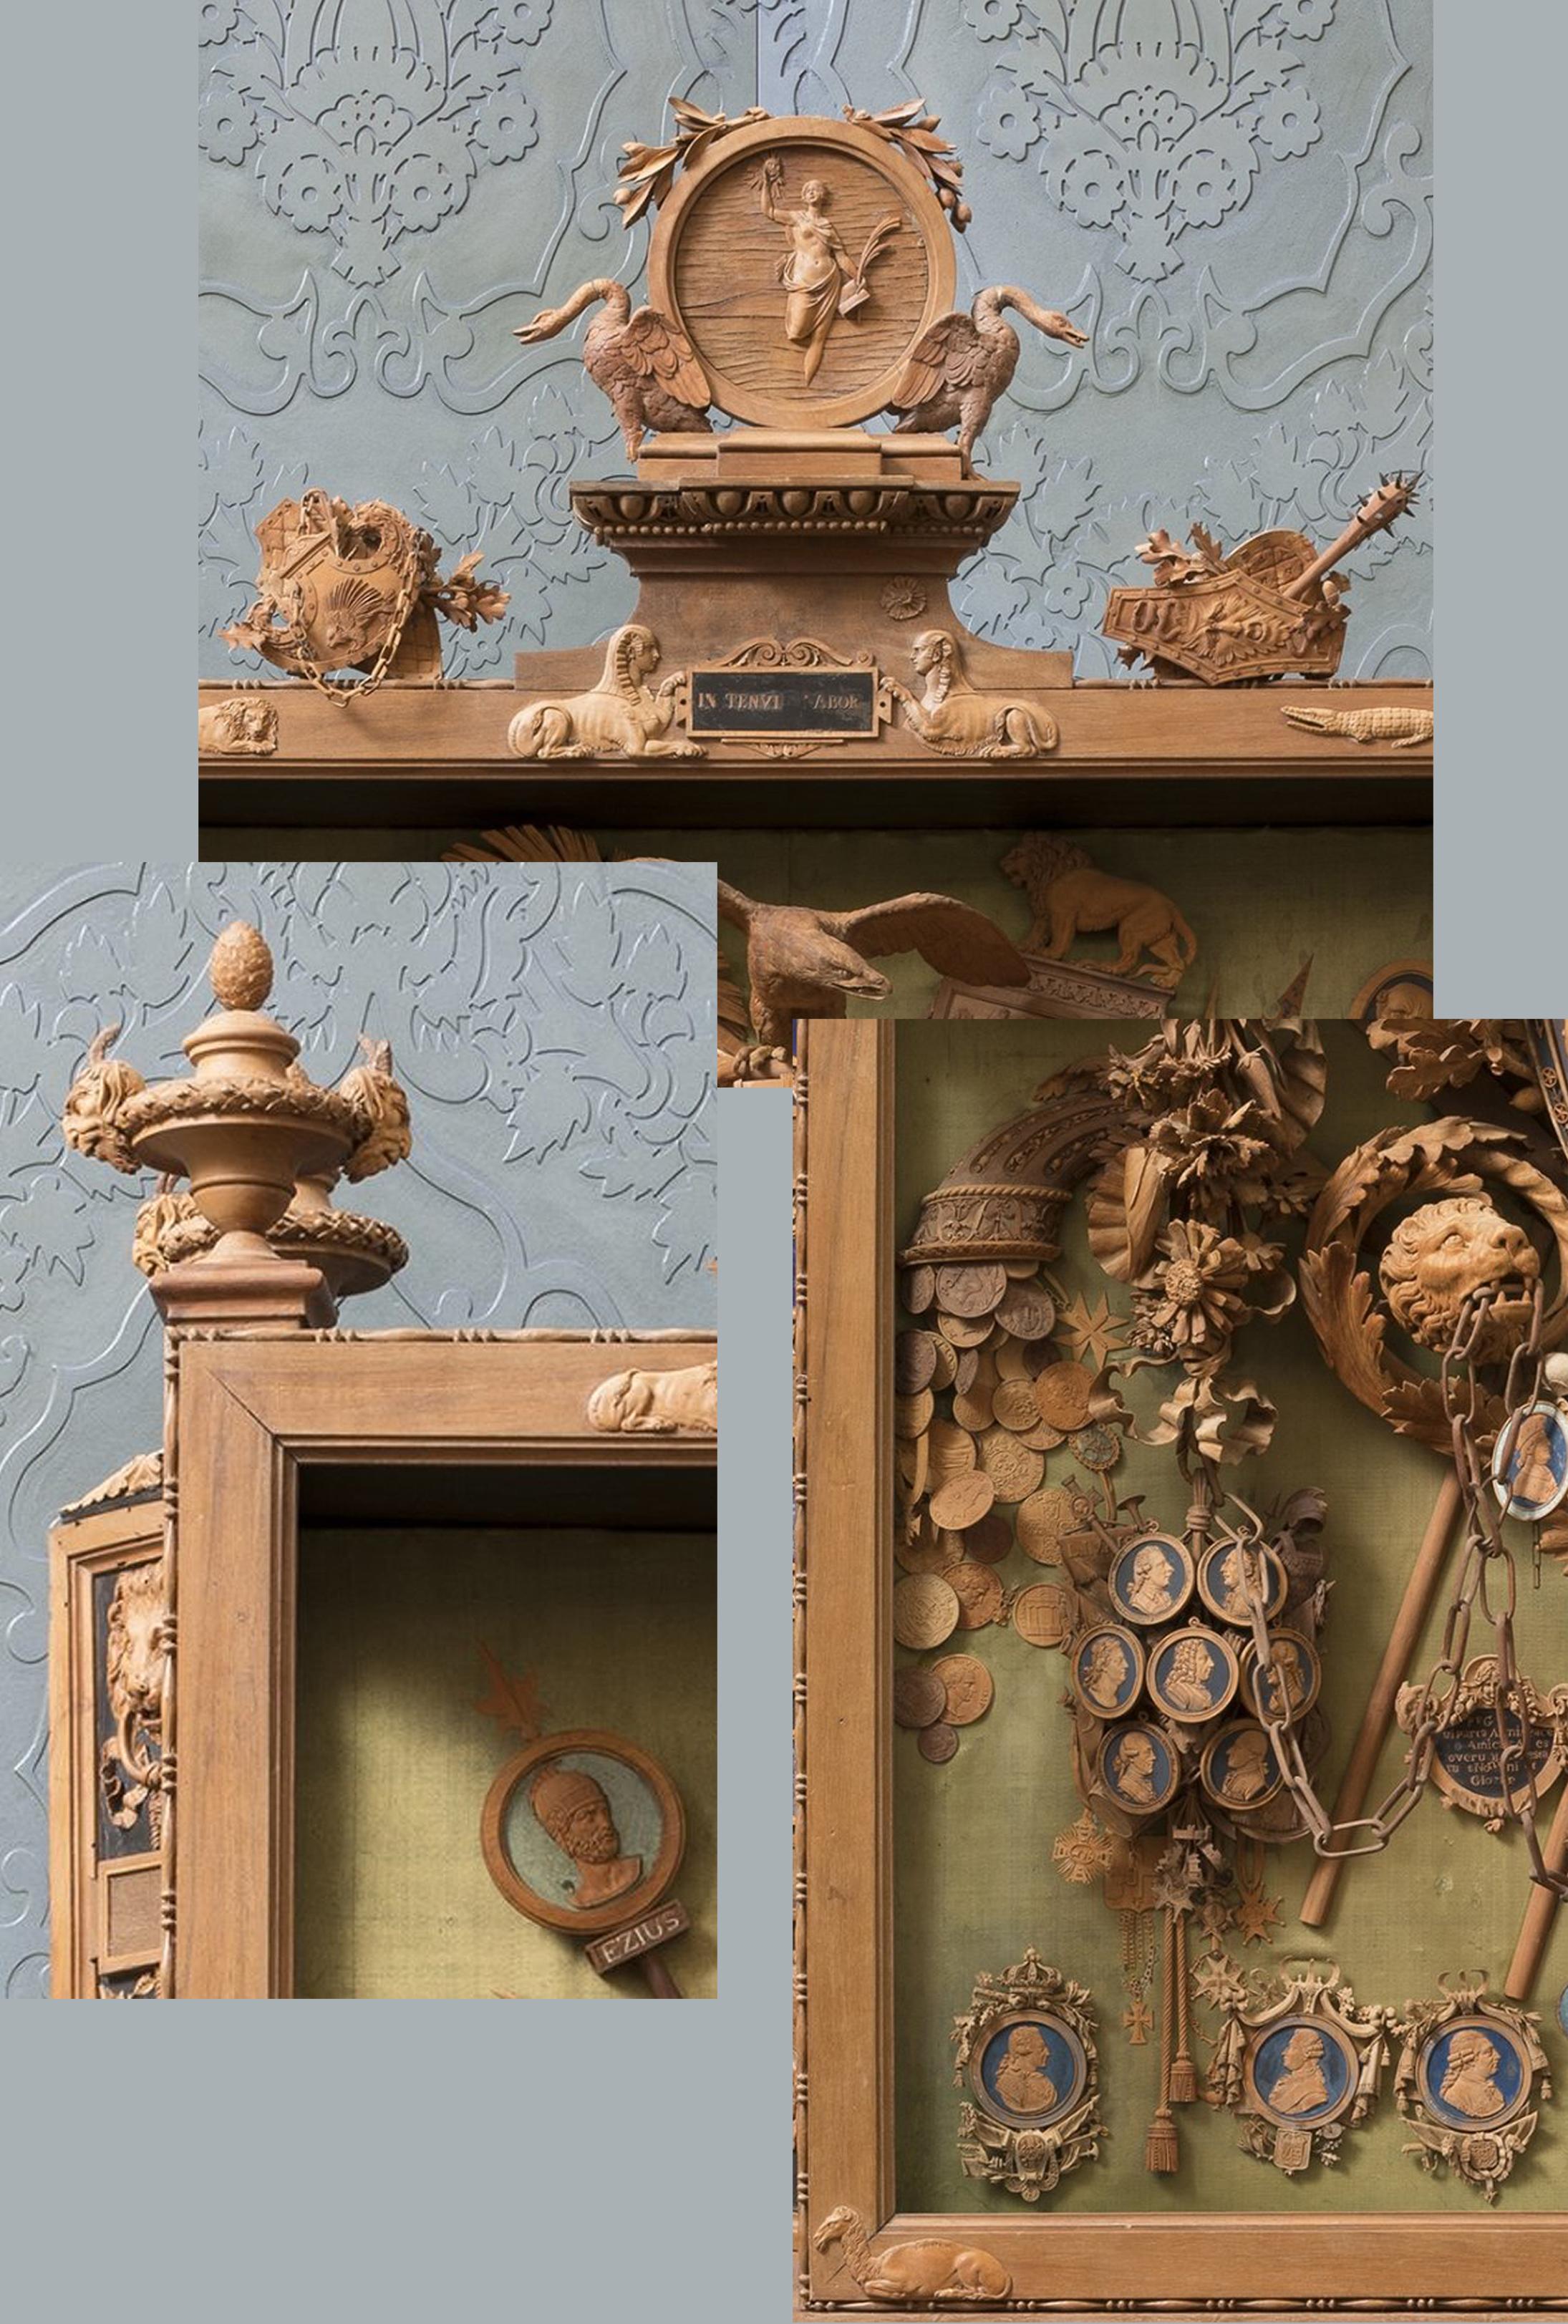 10D Bonzanigo Military trophy 1793-1814 Palazzo Madama Turin details